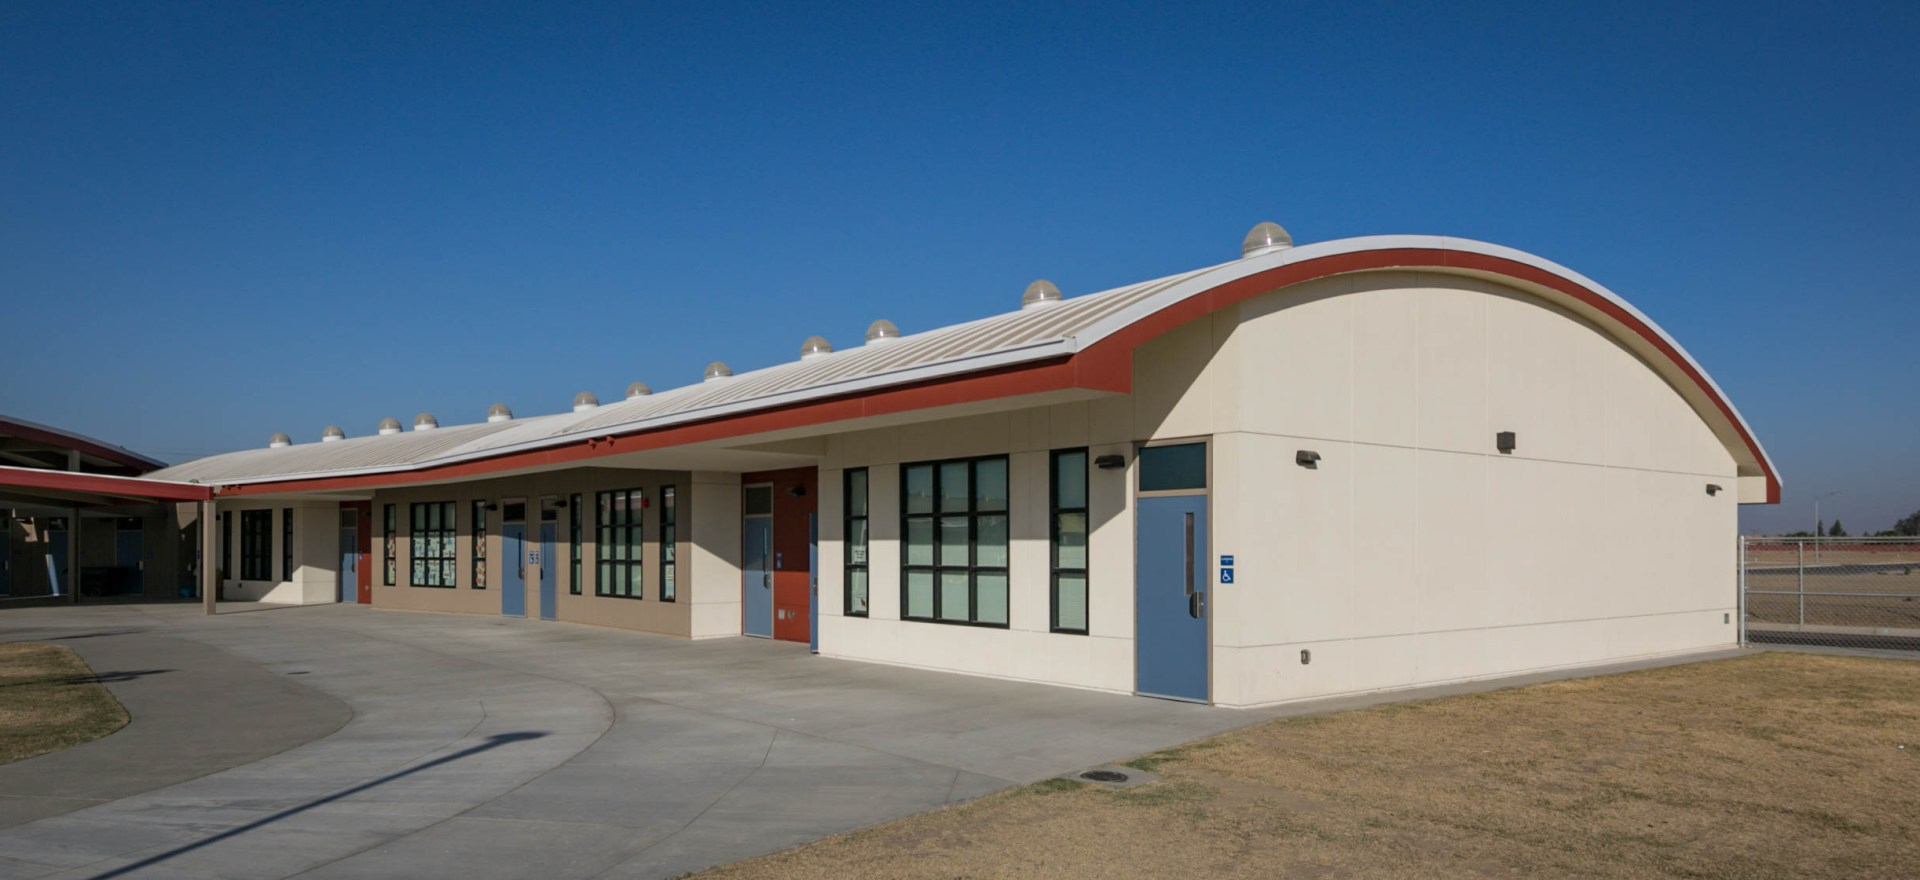 JTSModular-WhitleyElementarySchool-RobRijnenPhotography (6 of 36)